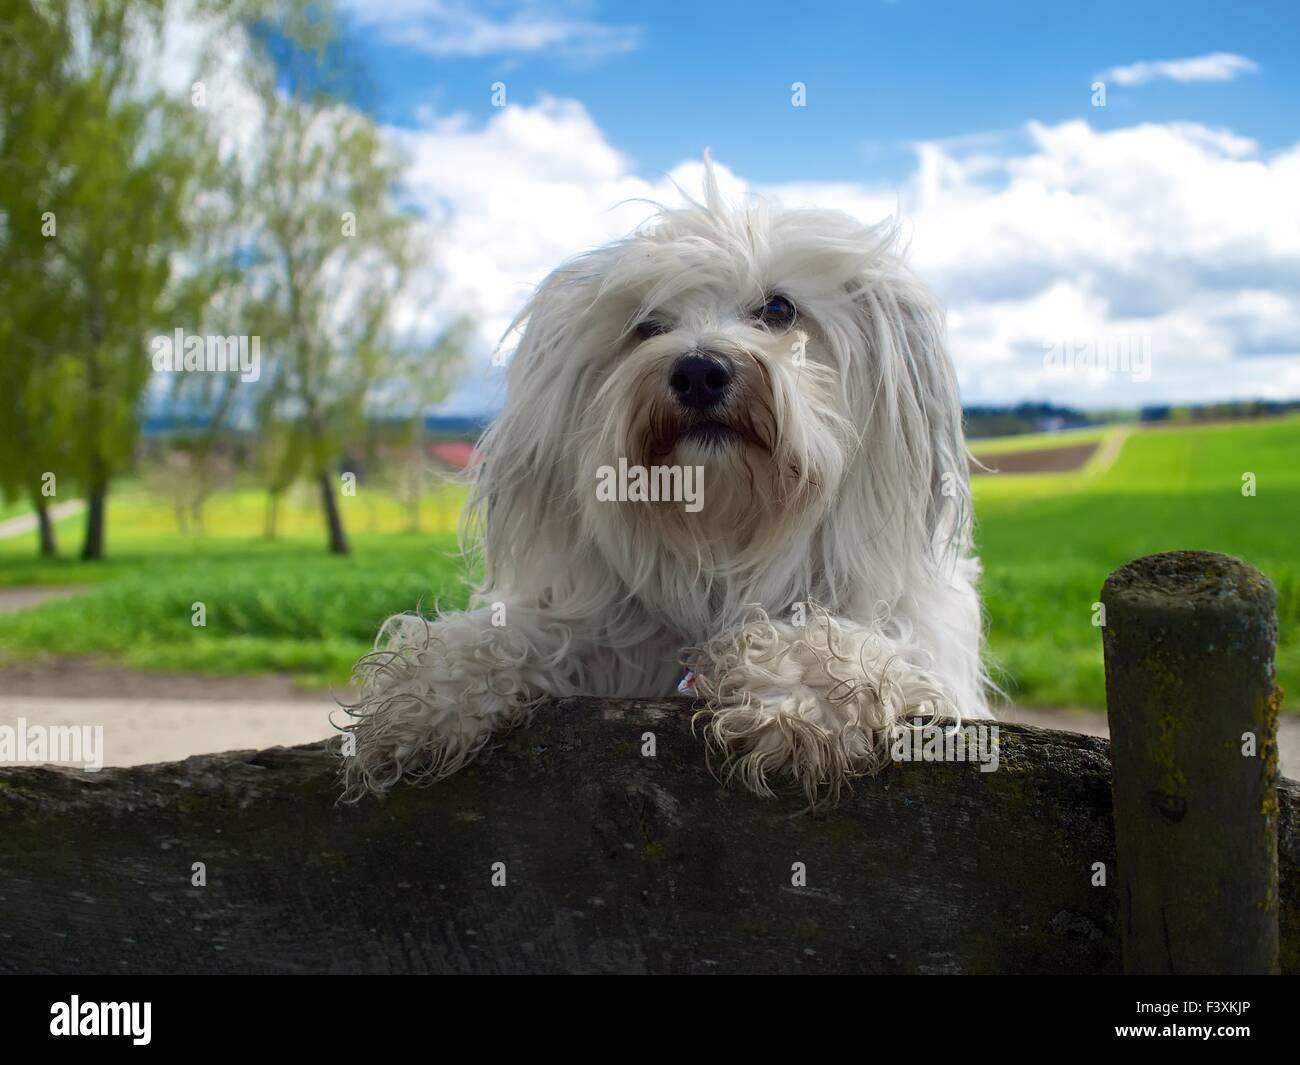 Cool Dog - Stock Image